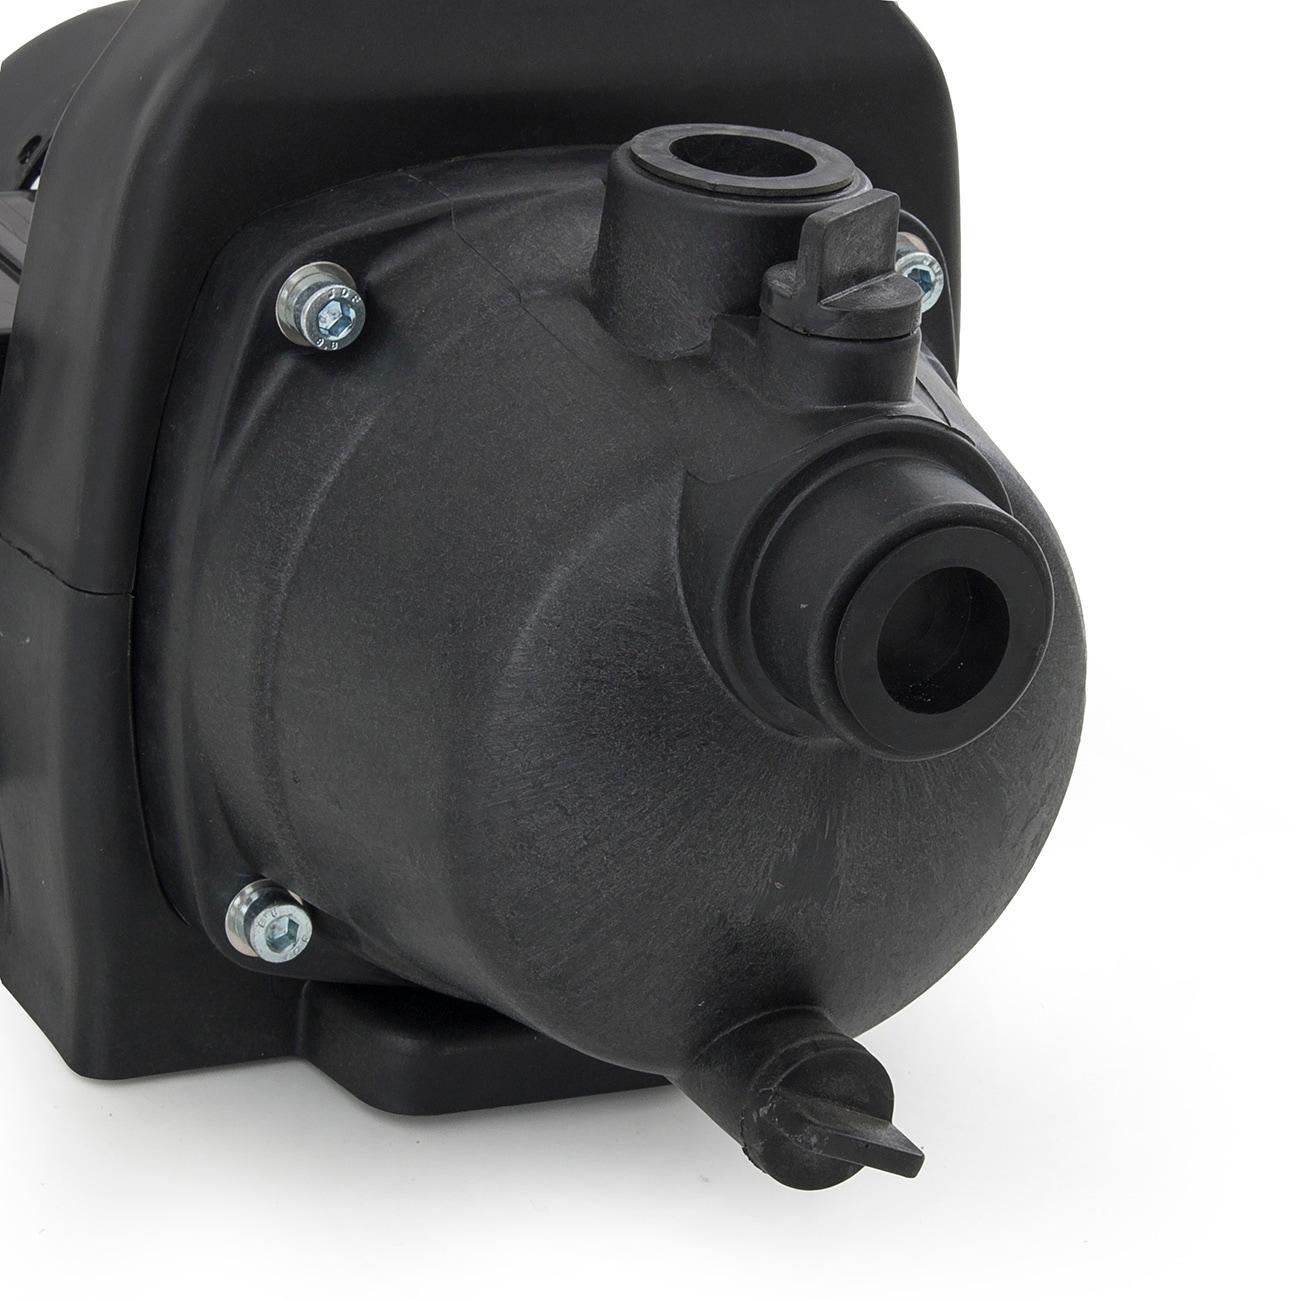 Arksen 1200W Shallow Well Pressurized Booster Water Pump Home Garden  Irrigation 925GPH